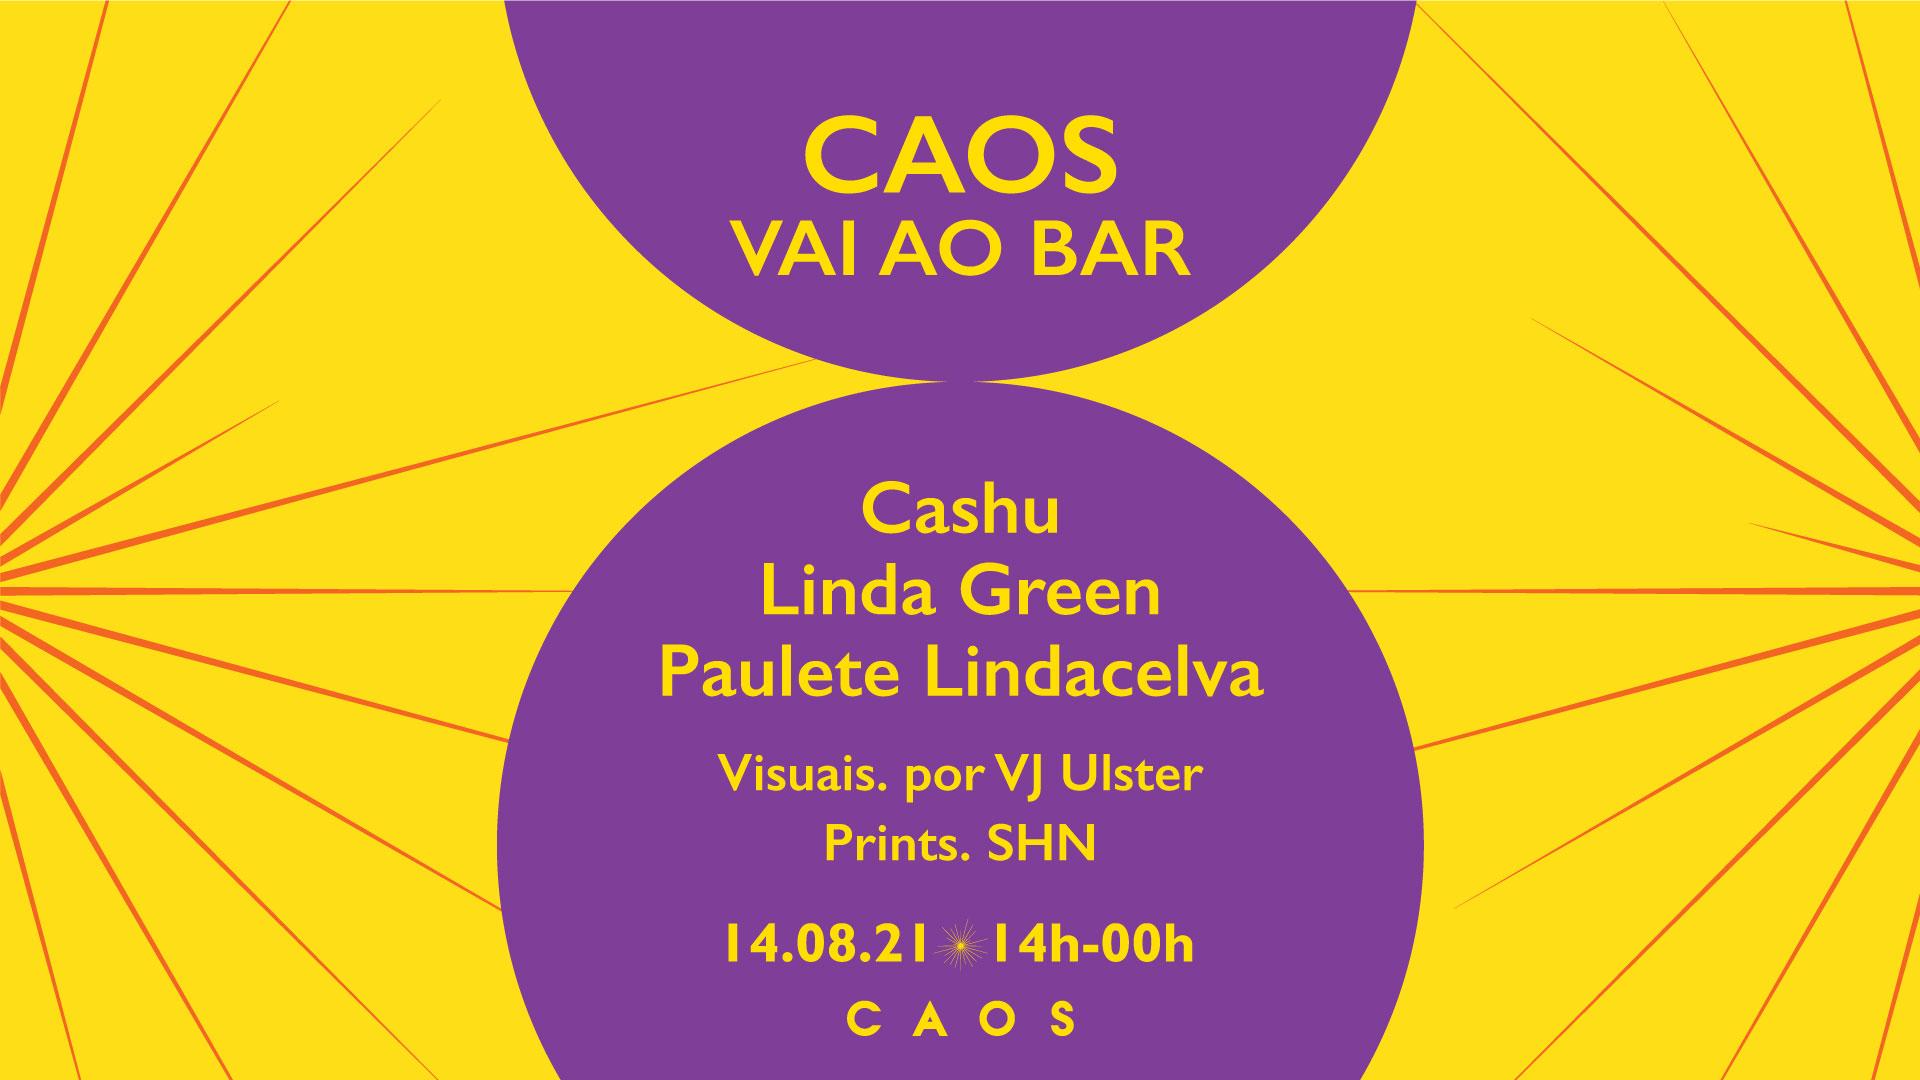 Caos vai ao Bar: Linda Green, Cashu e Paulete Lindacelva